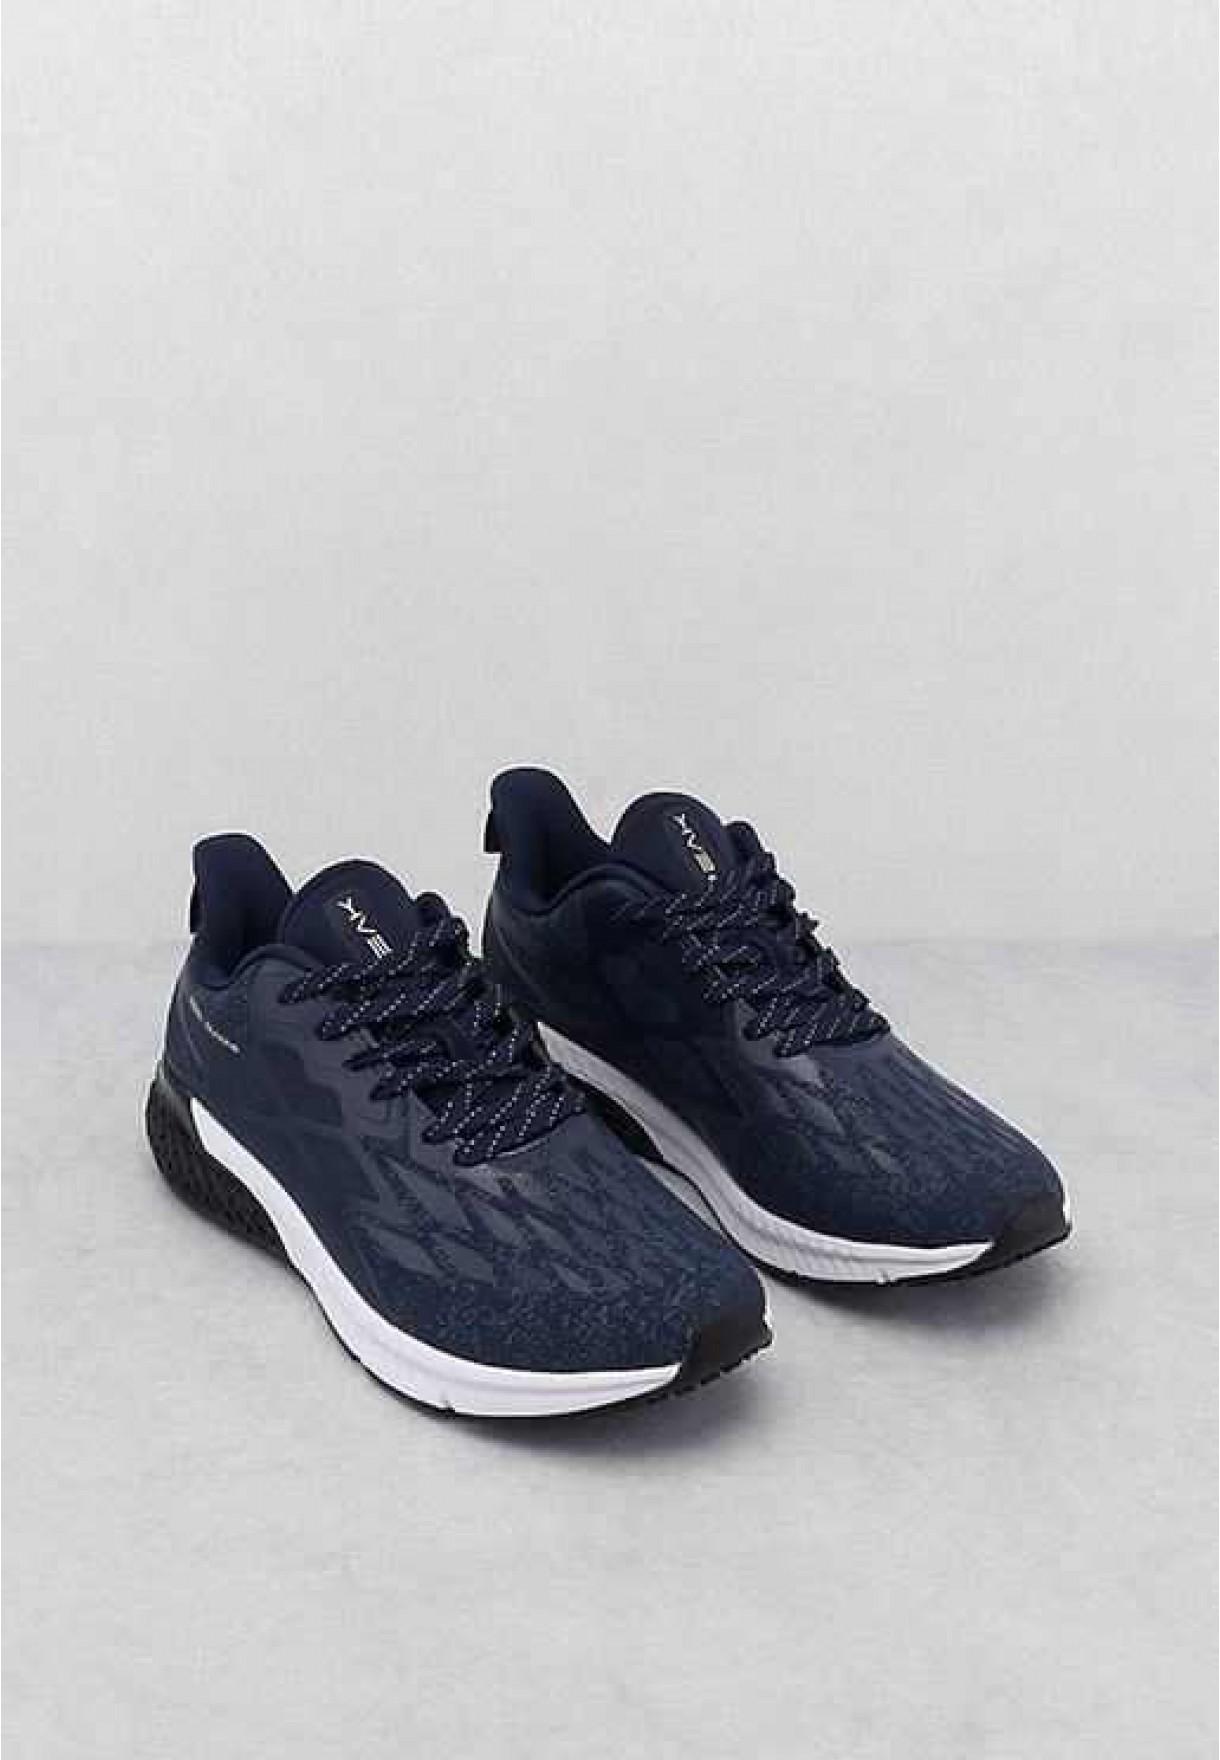 Cushion Running Shoes